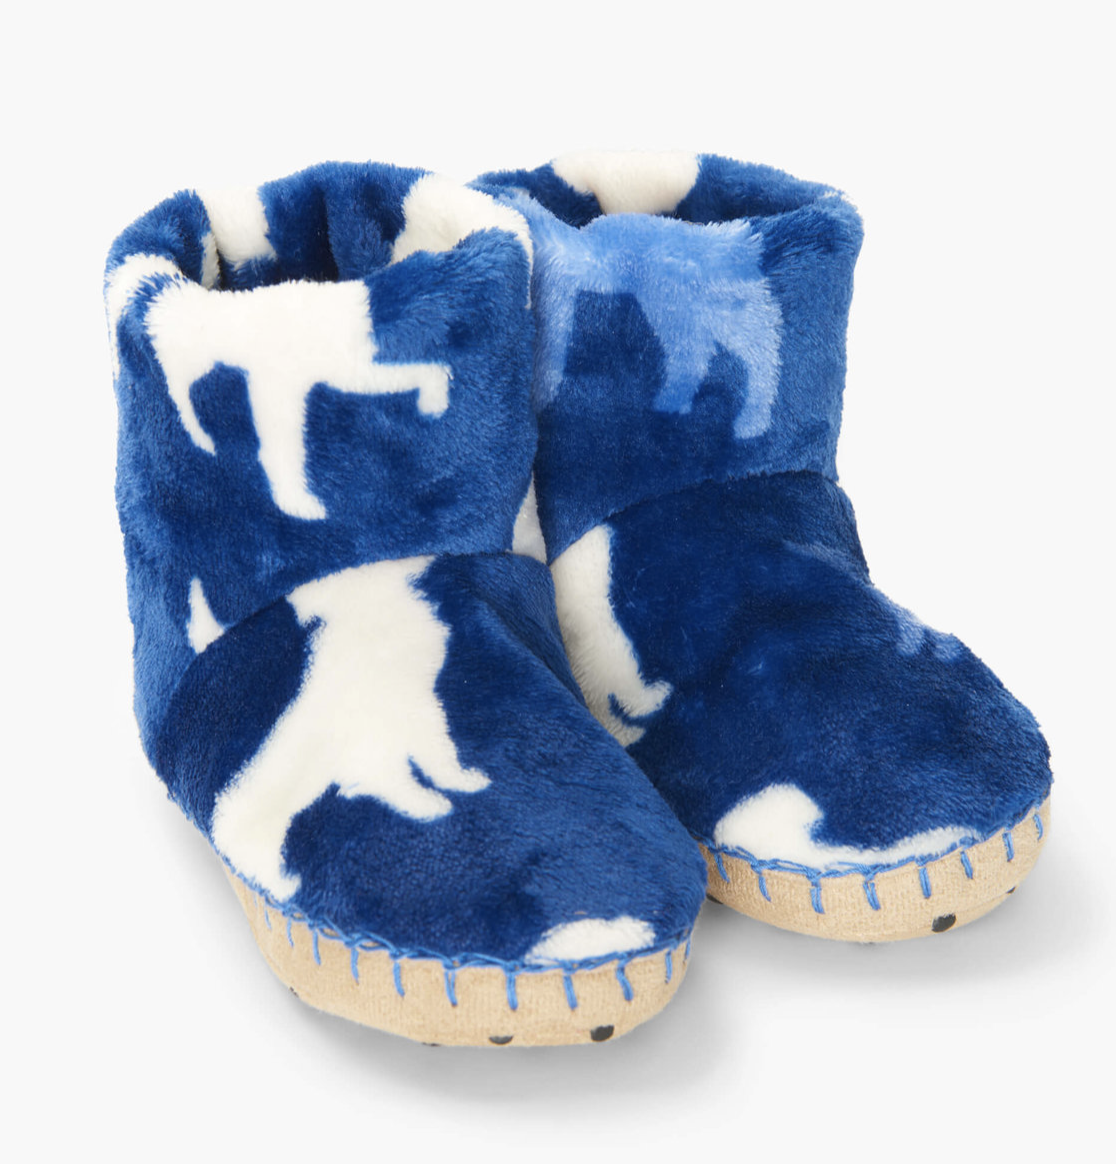 Silhouette pups fleece slippers